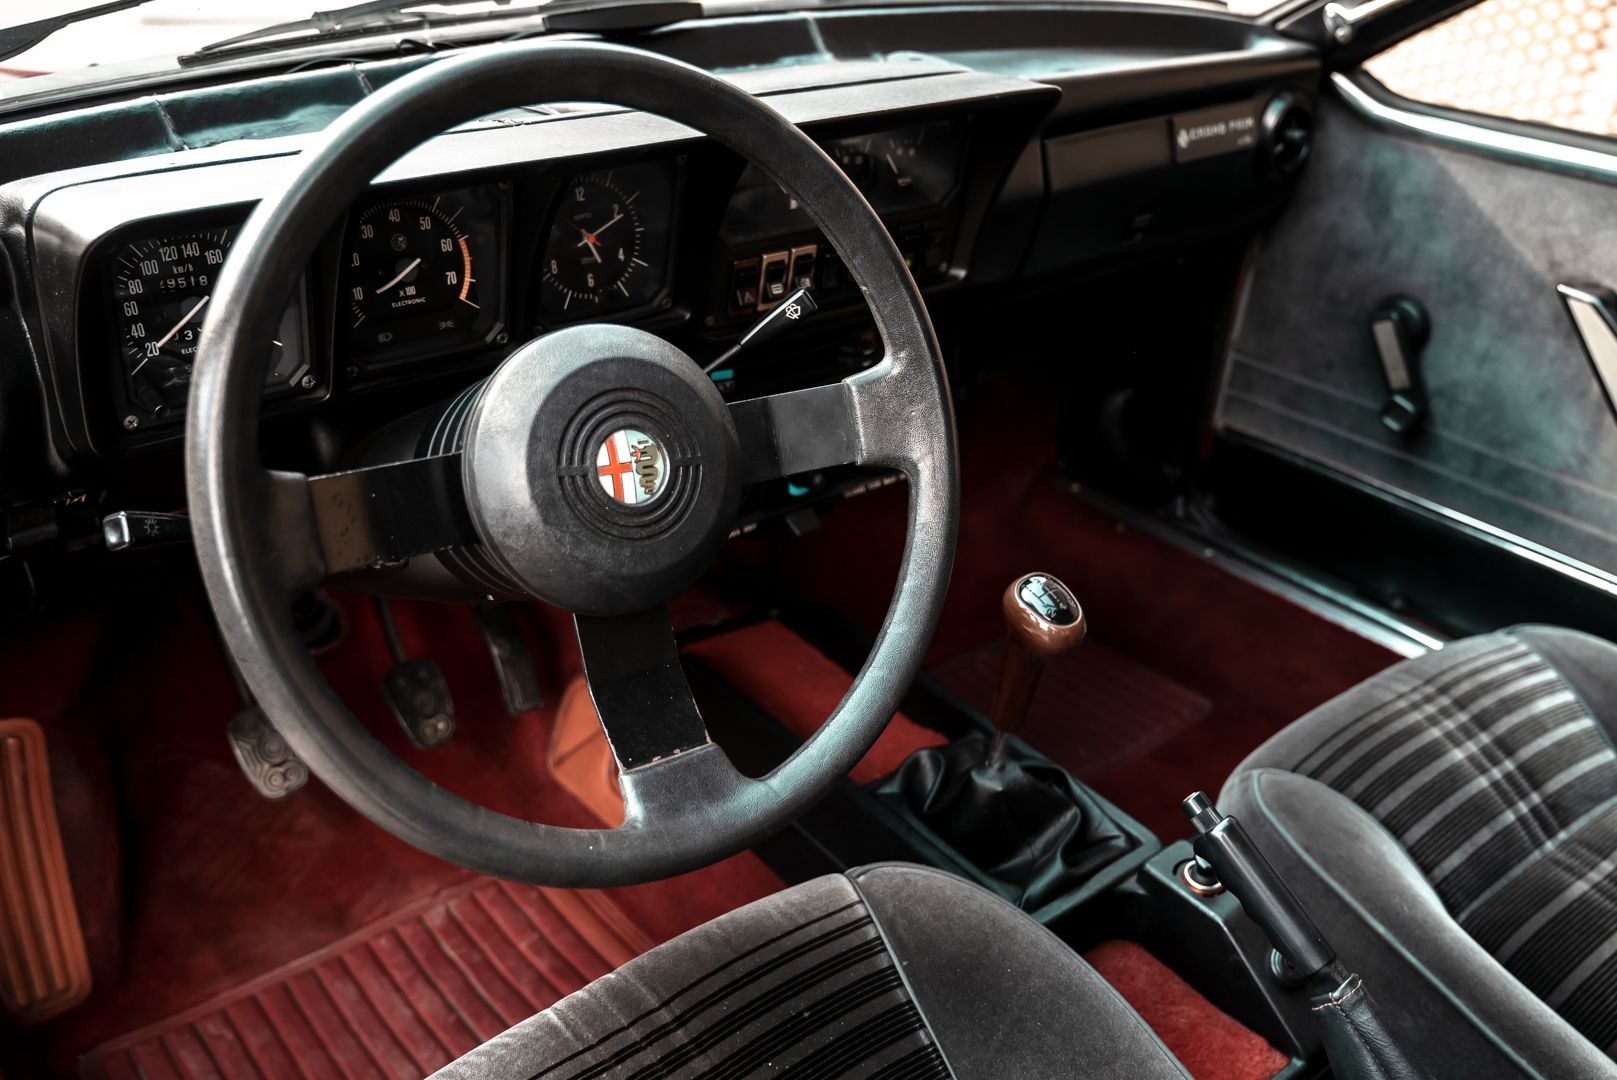 1981 Alfa Romeo Alfetta GTV Gran Prix n.128 68583